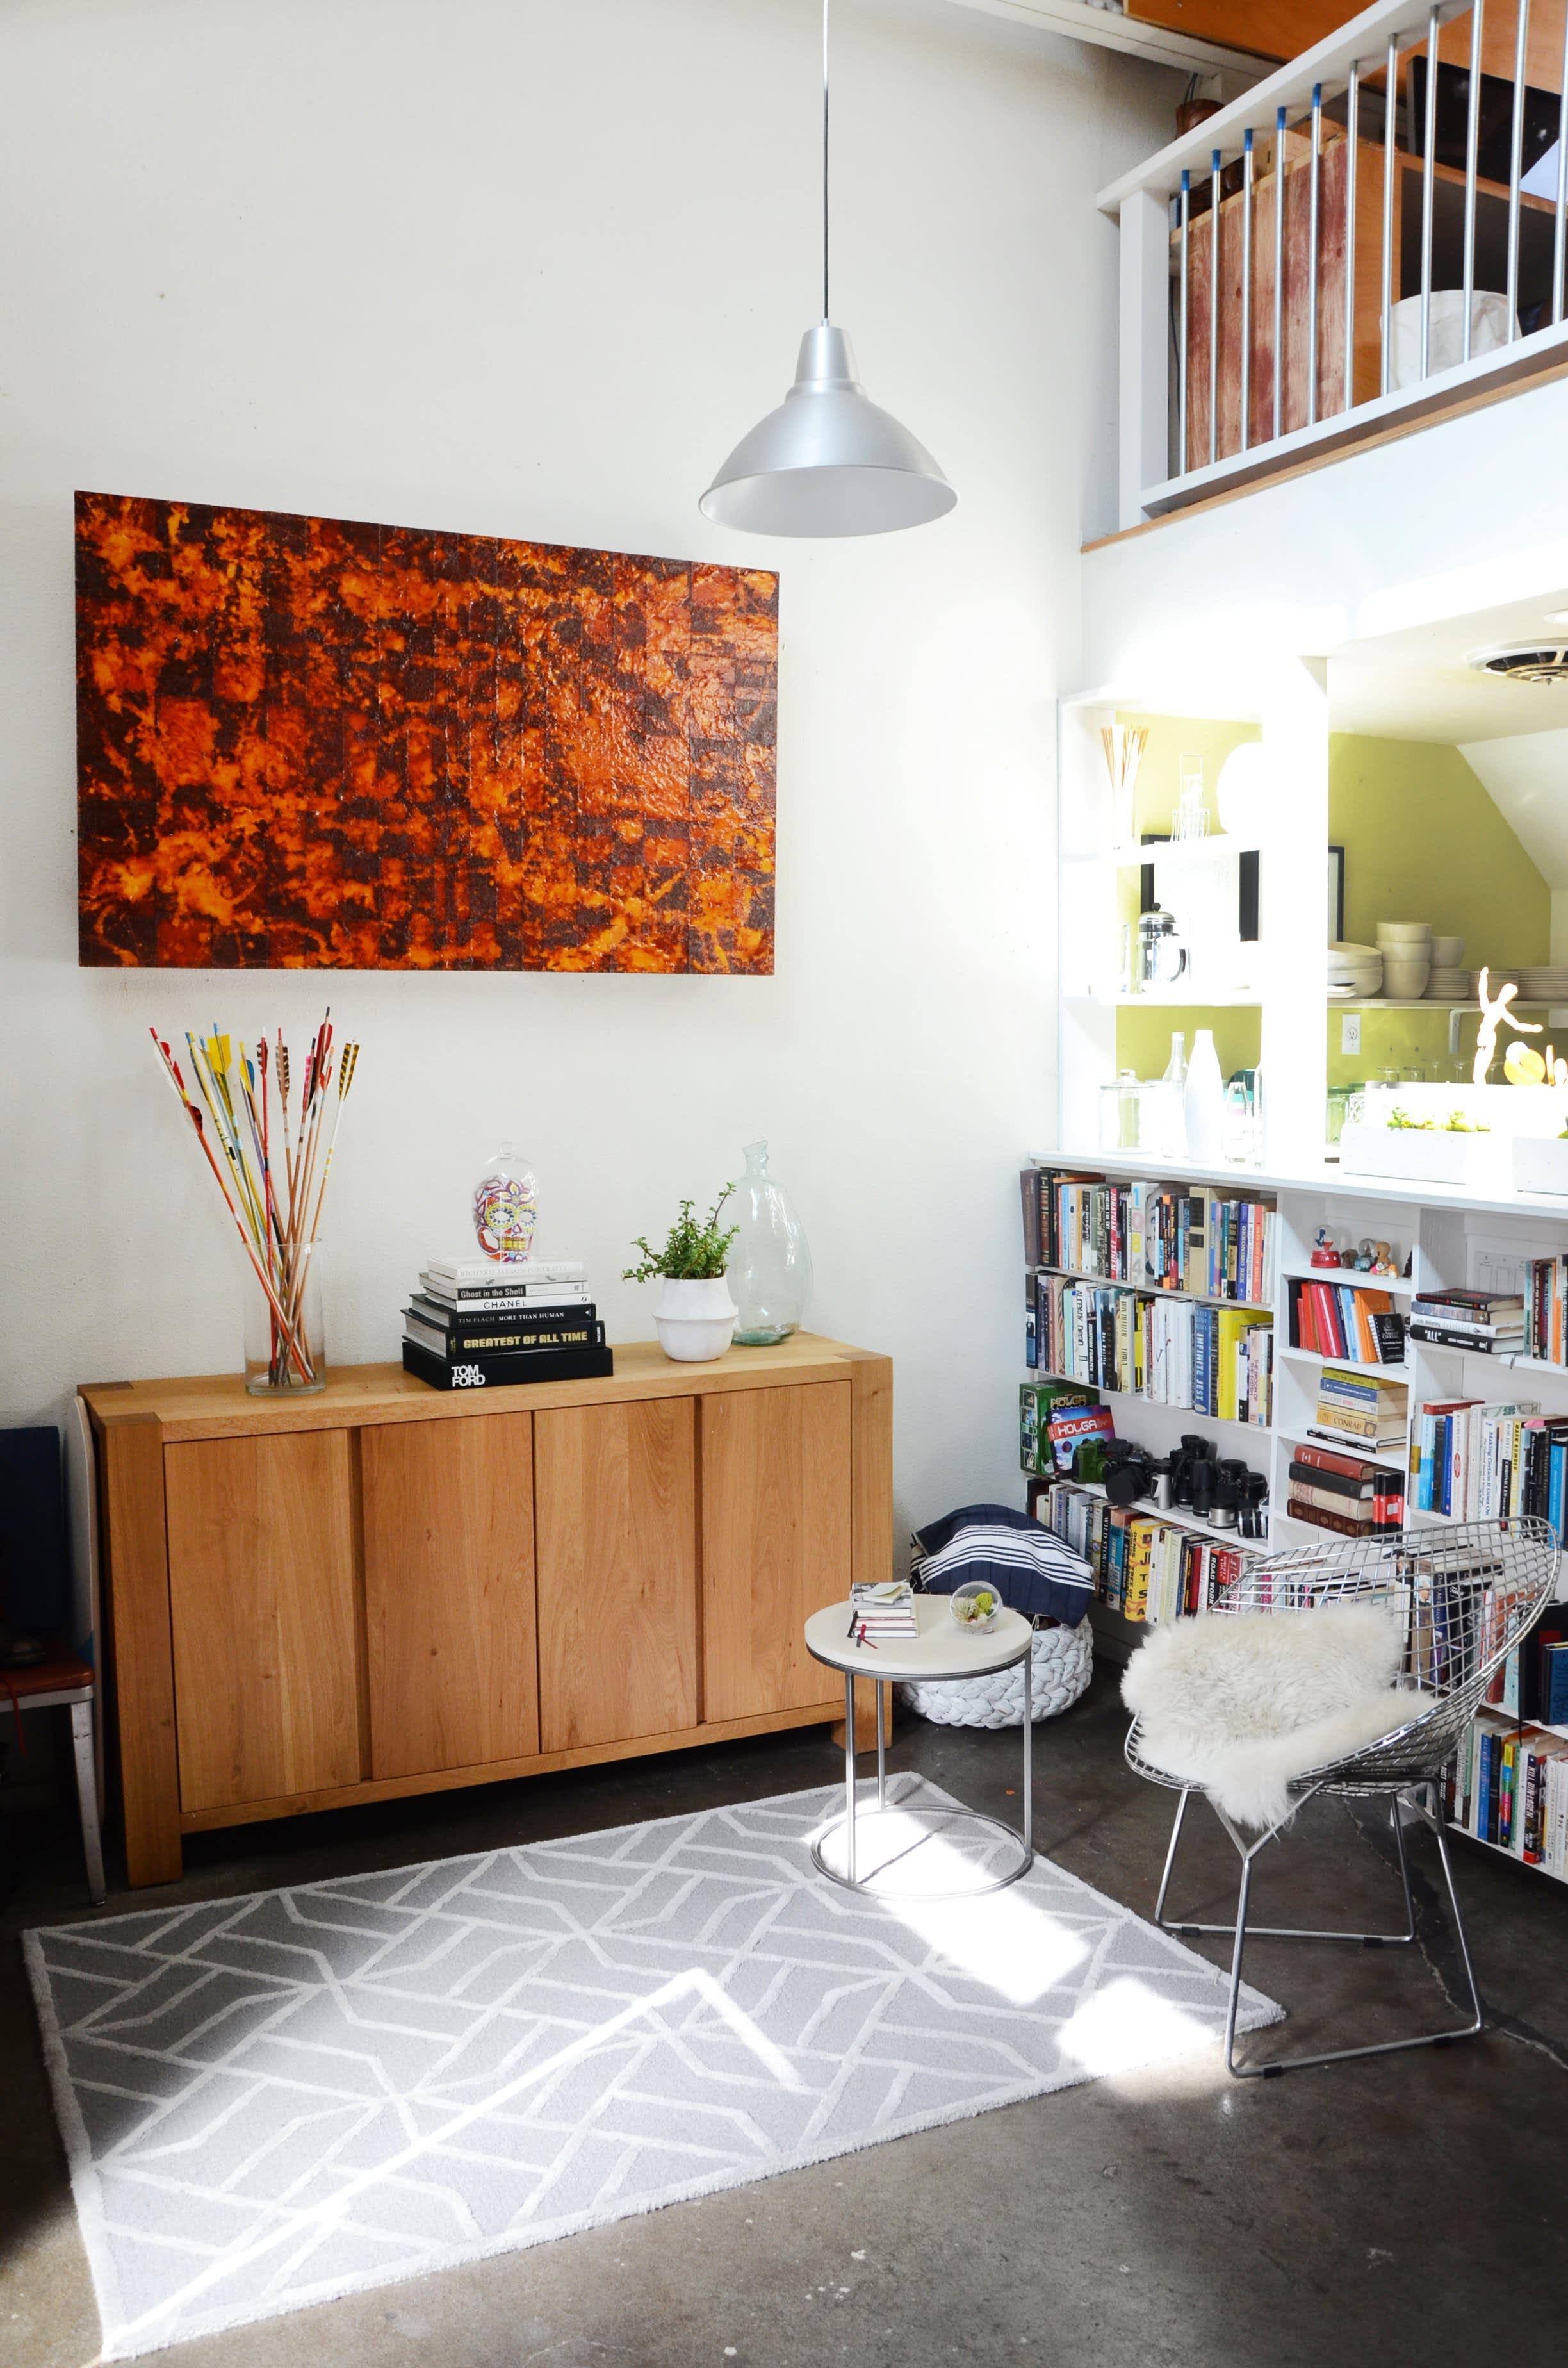 House Tour: A Modern & Personalized West Oakland Loft